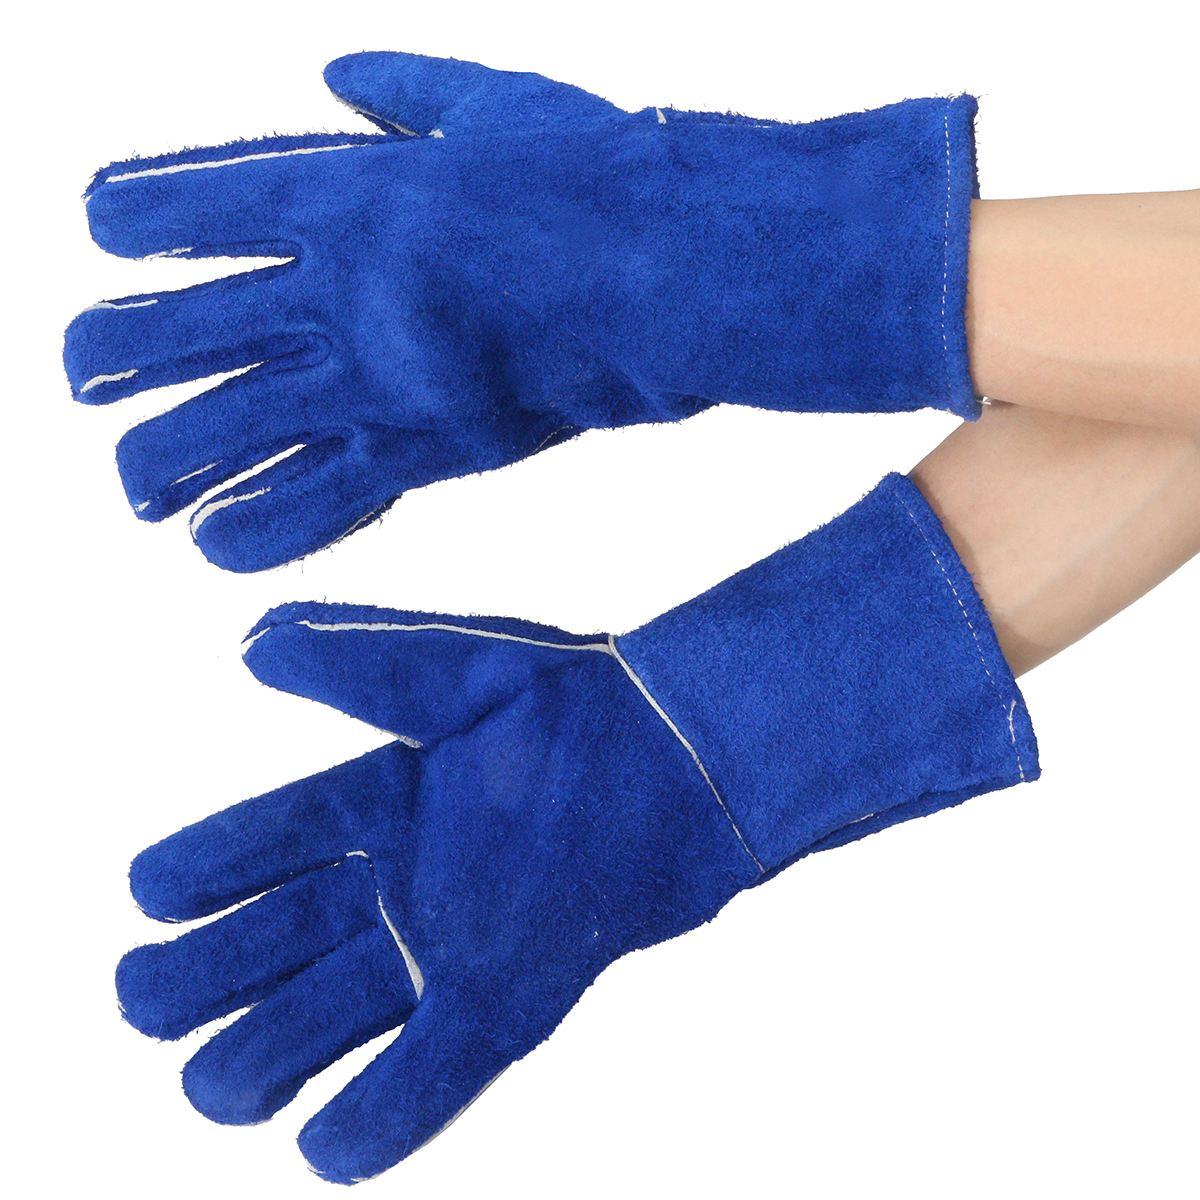 NEW 14 Welding Gloves Gauntlets Welder Hands Fire High Temperature Protection Blue Workplace Safety Glove 3 pairs oxygen tig welding gloves work gloves breathable firebreak welder safety glove